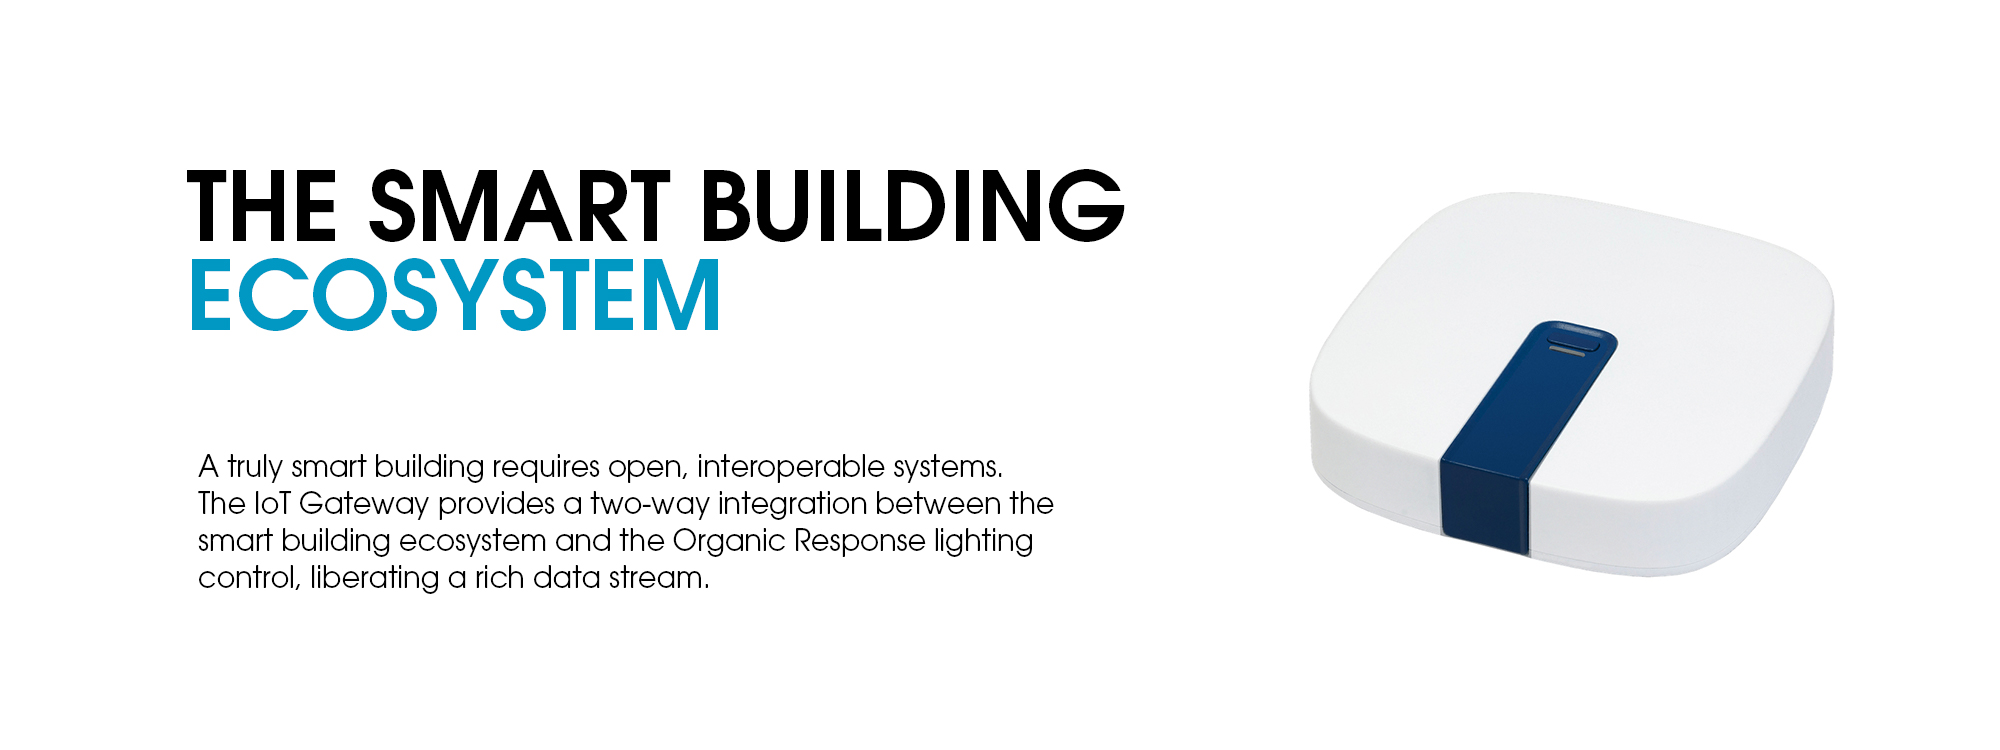 Carousel Banner - Smart Building Ecosystem.jpg